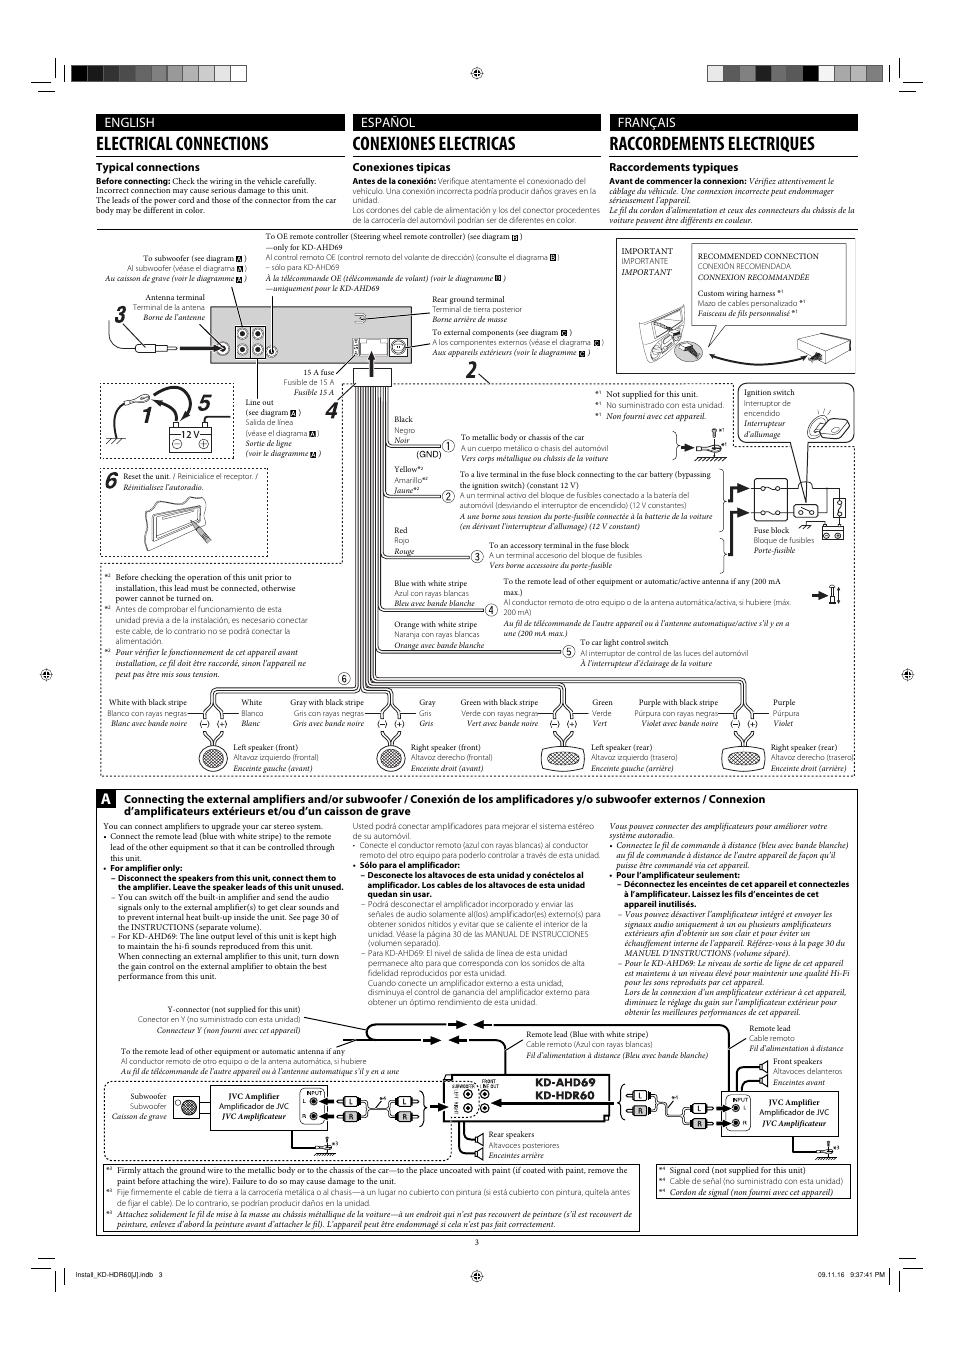 Kd Ahd69 Wiring Diagram